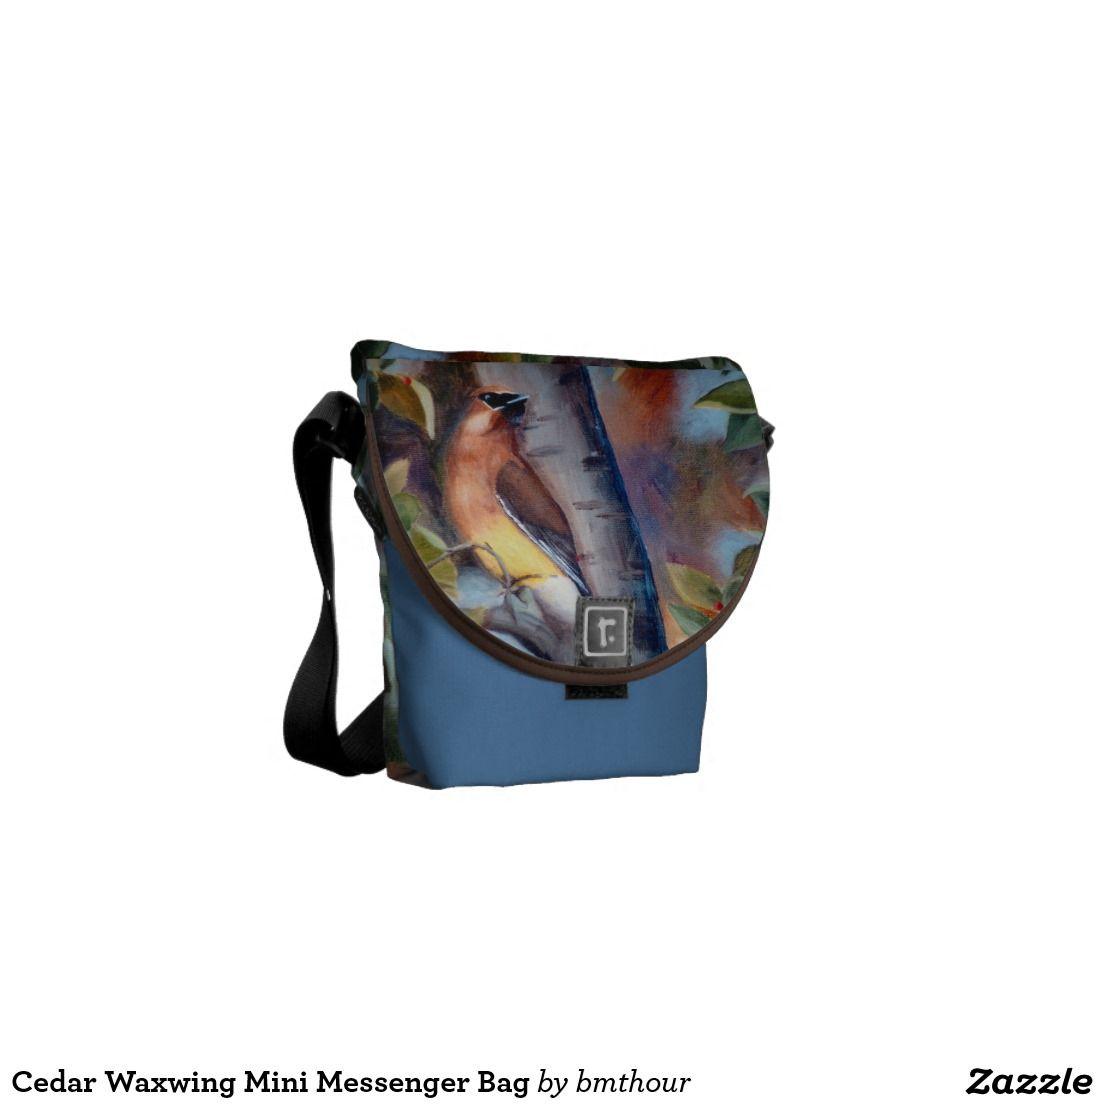 Cedar Waxwing Mini Messenger Bag